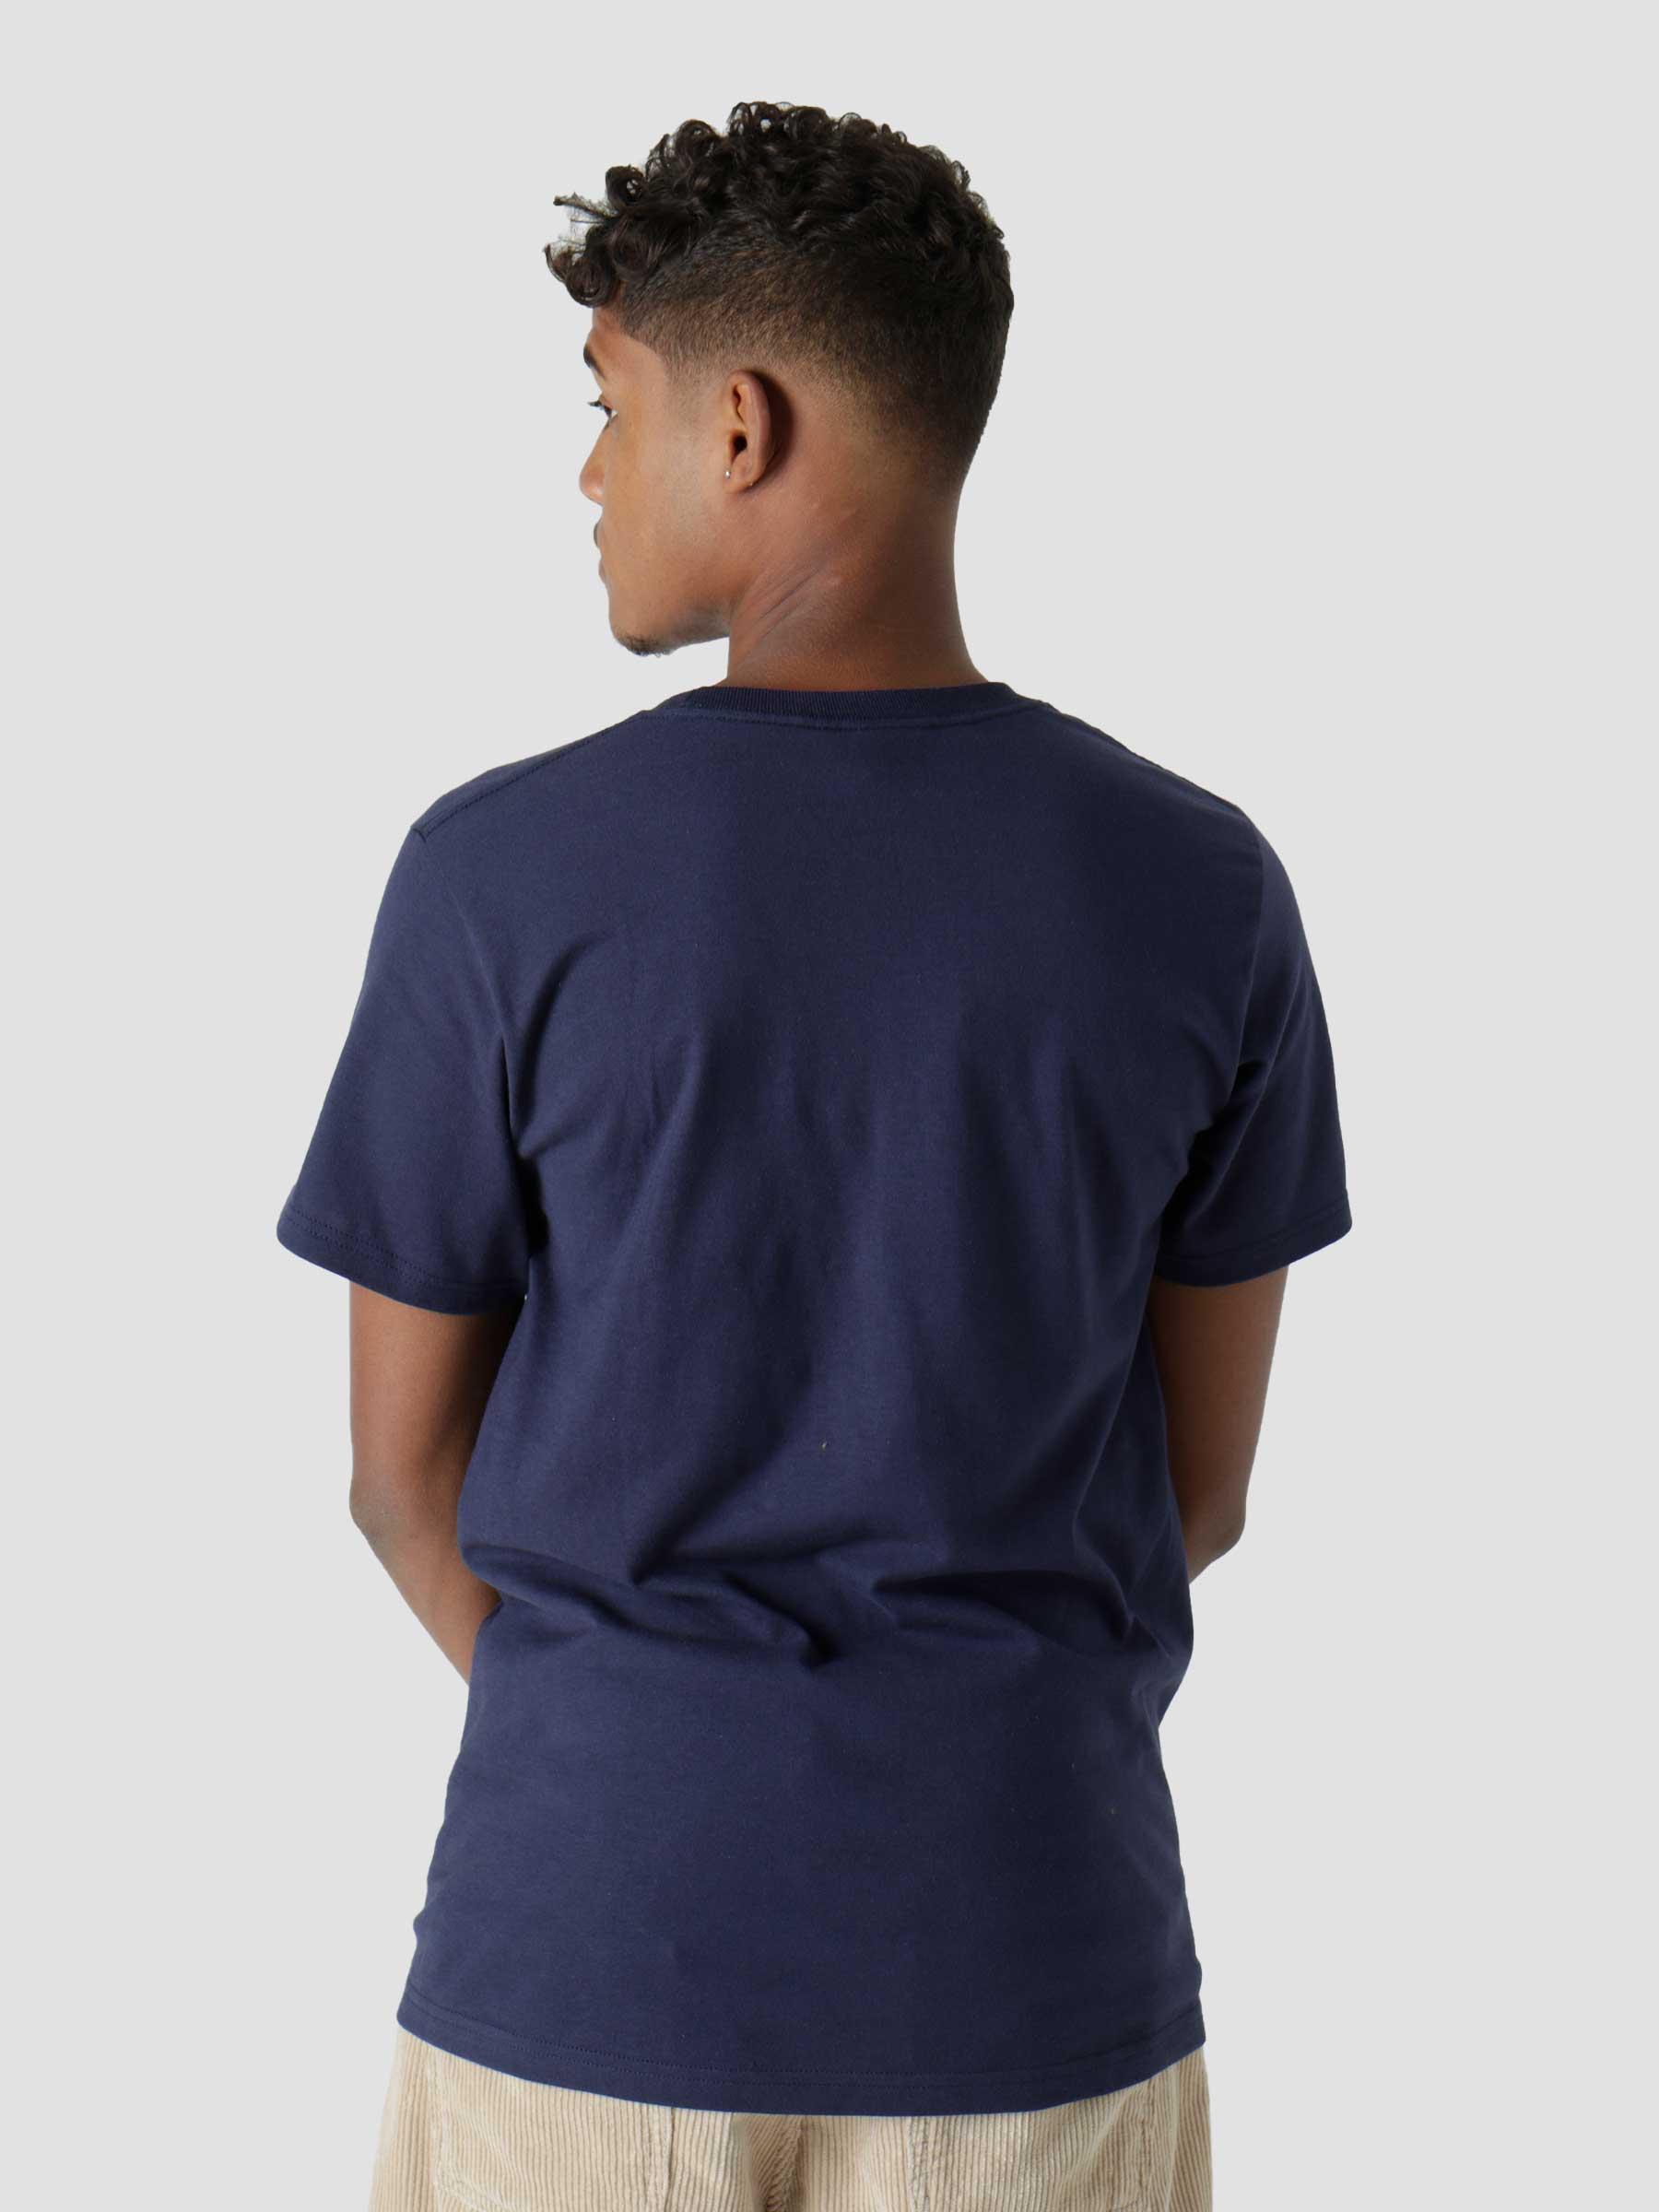 Happy Flower T-Shirt Navy 1904708